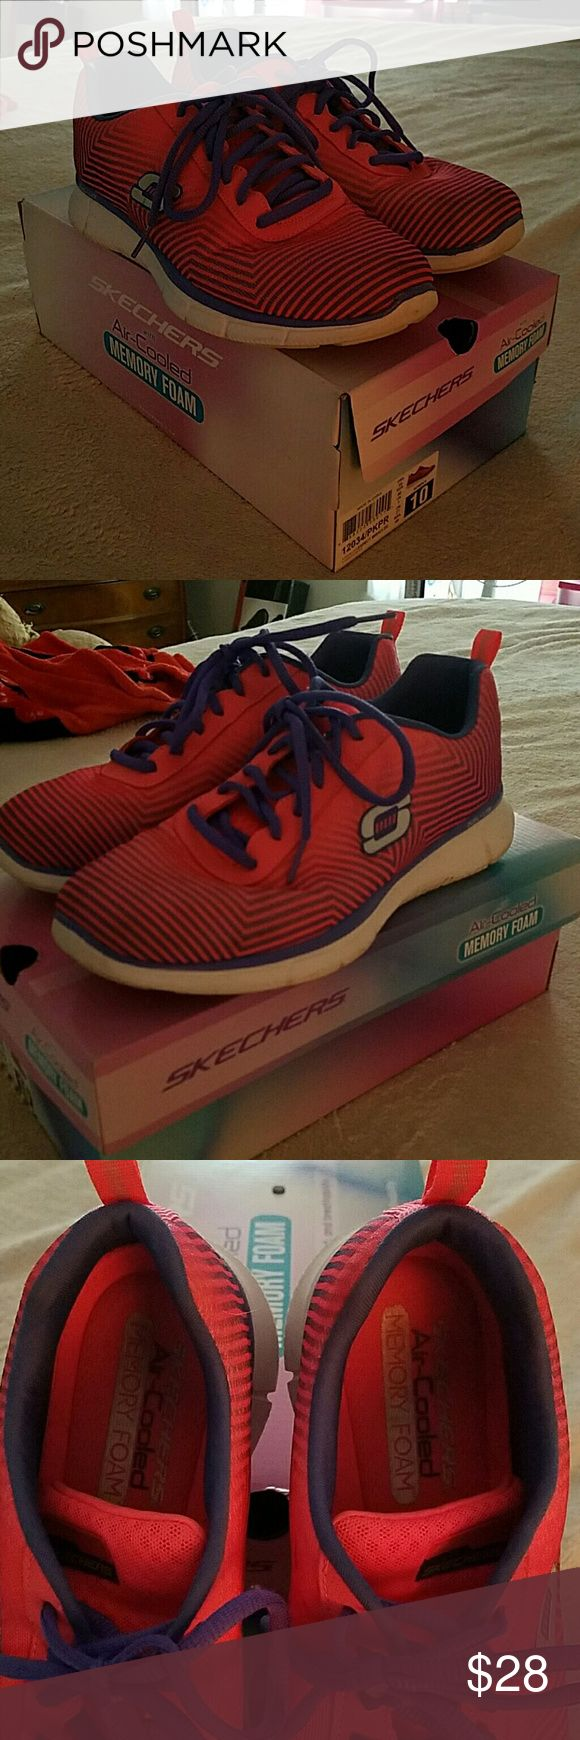 Skechers air cooled memory foam Size 10 worn for work. Still good shape. Skechers Shoes Slippers